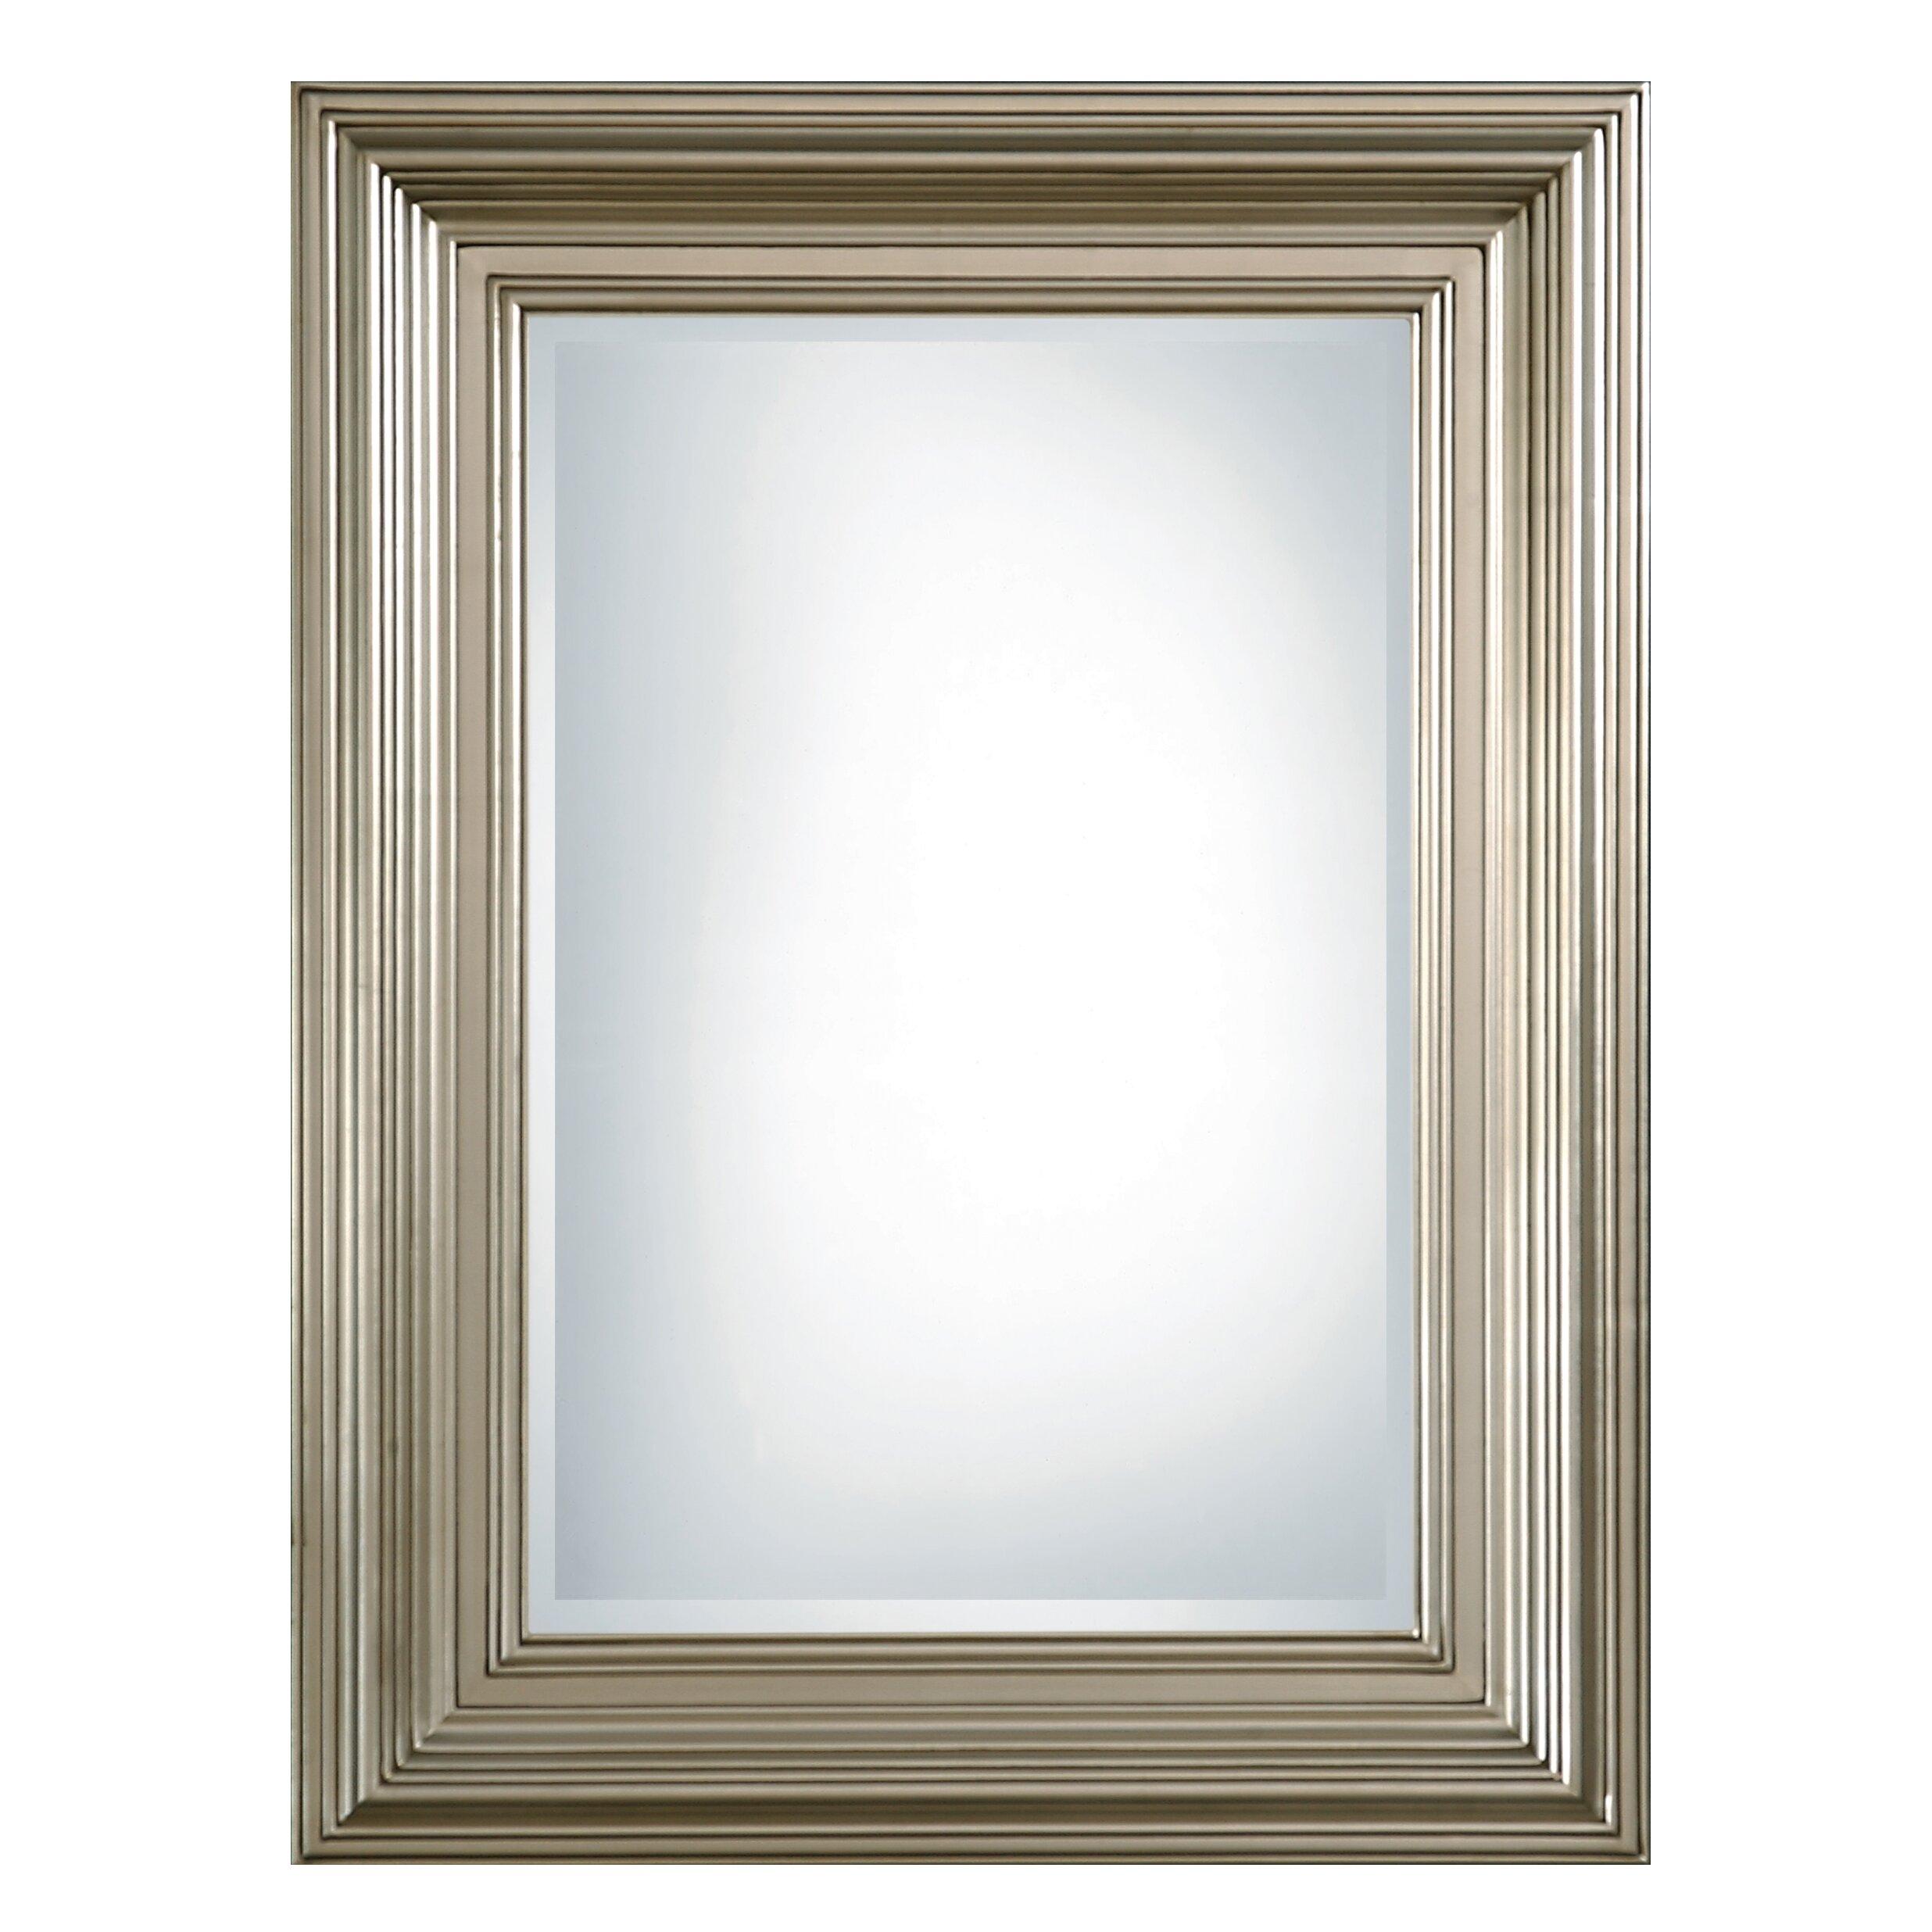 Uttermost mario rectangular beveled mirror reviews wayfair for Rectangle mirror